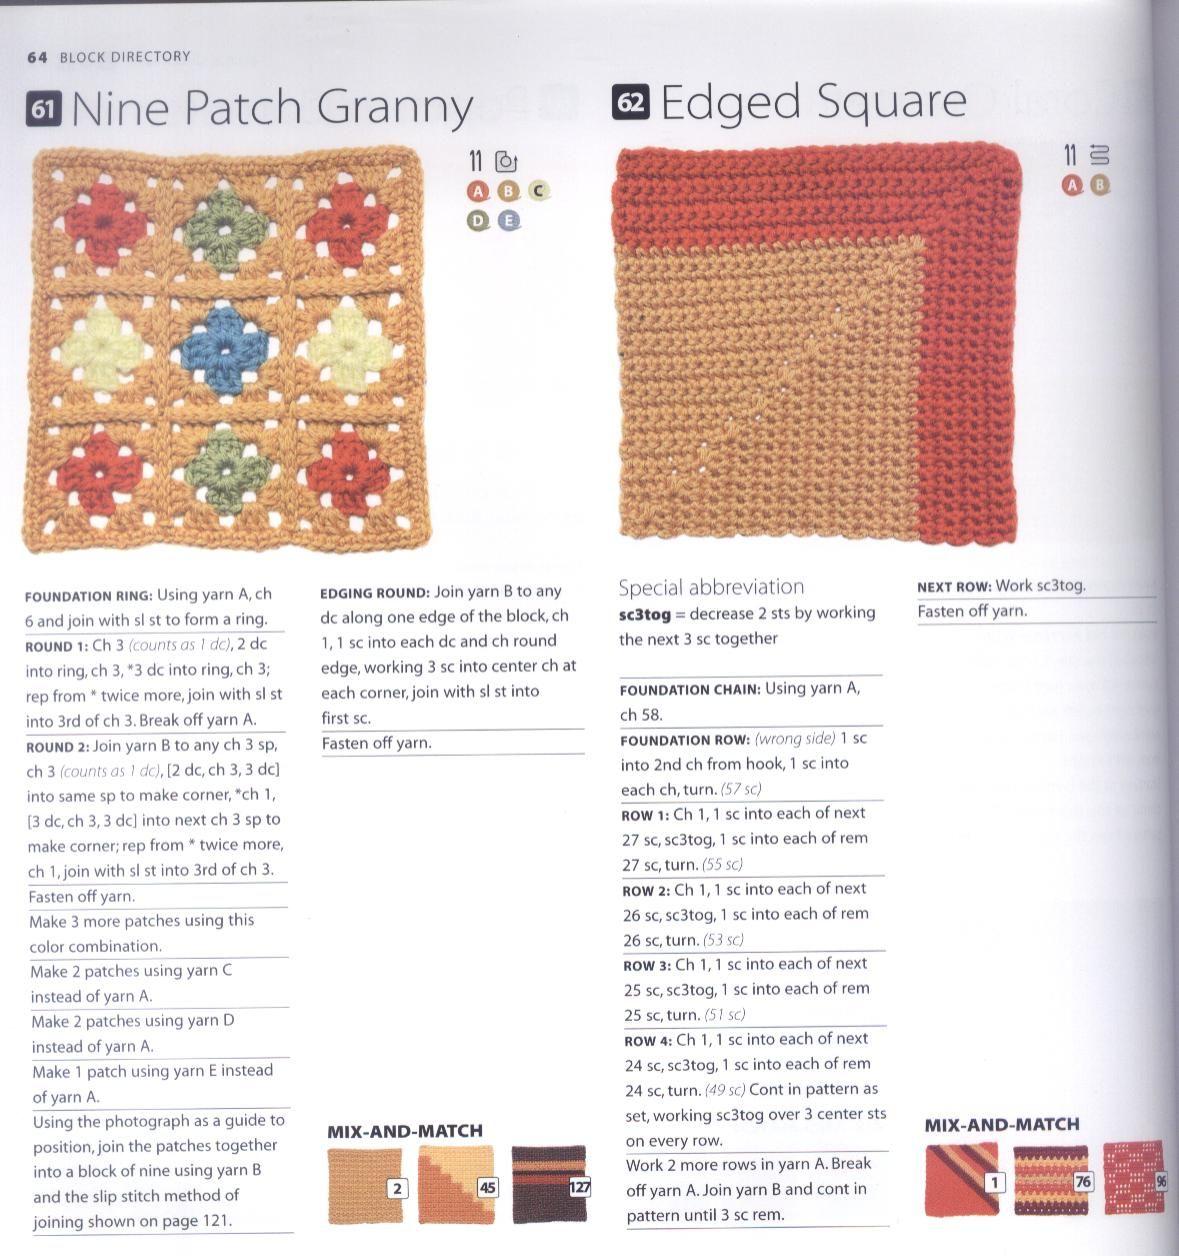 200 Crocheted Blocks for blankets, throws & Afghans 064